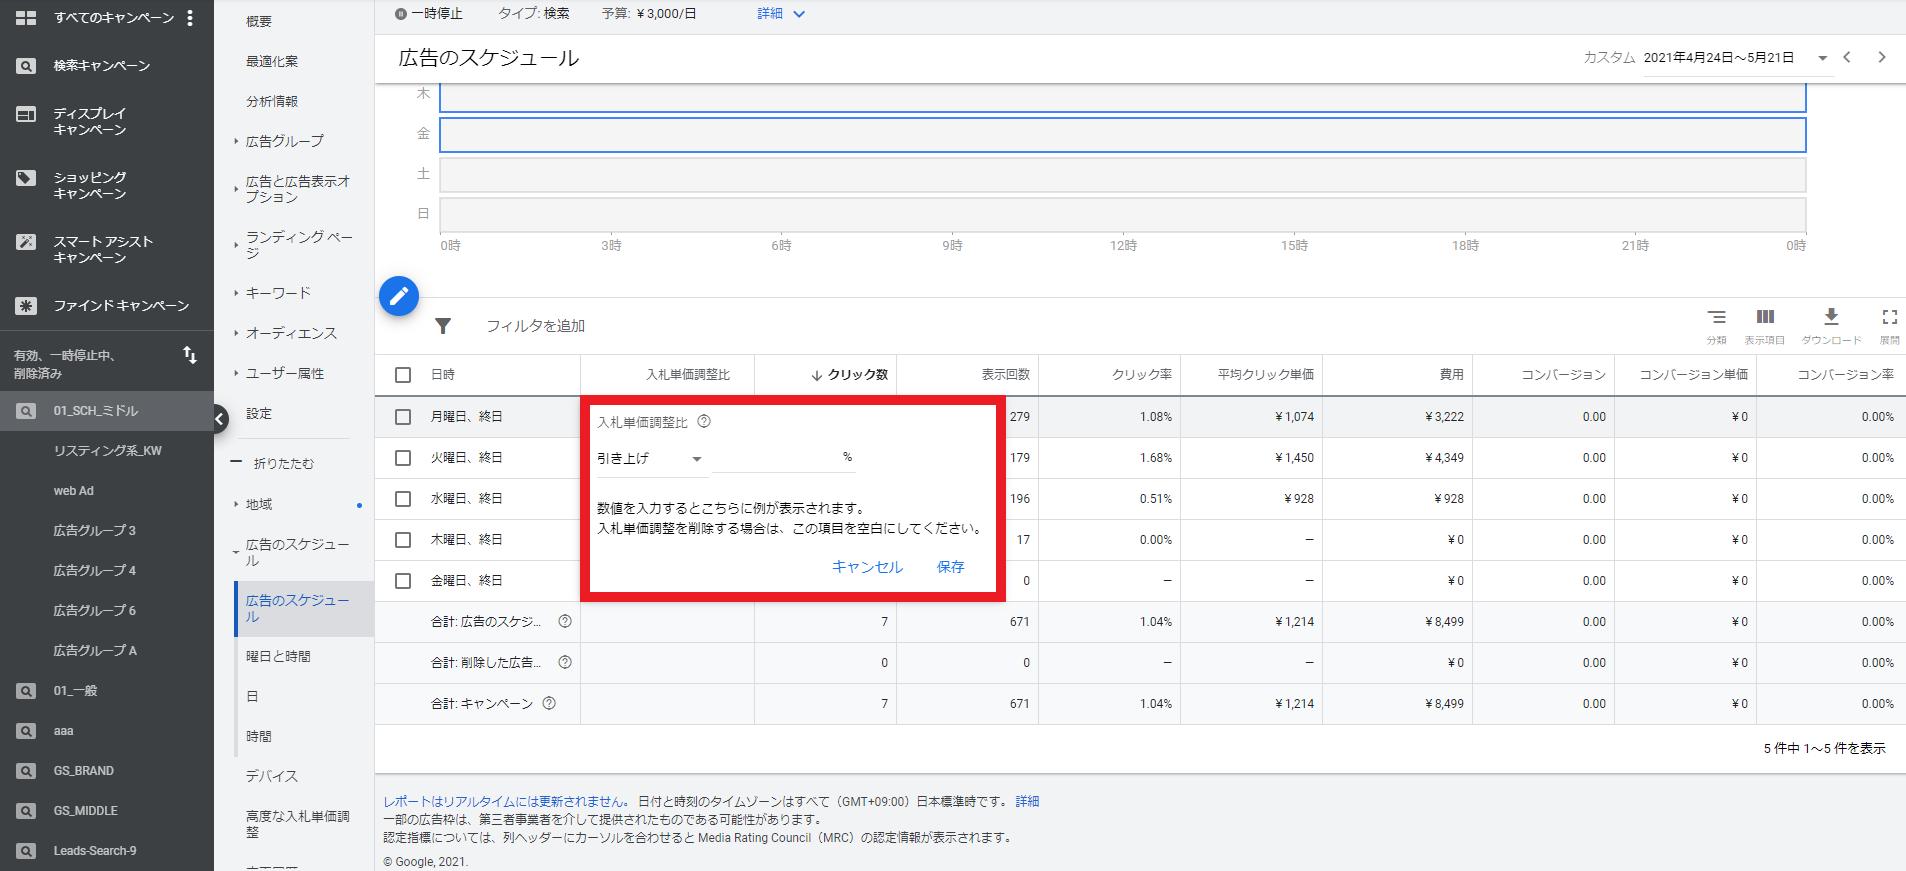 Google広告のスケジュールごとの入札単価調整